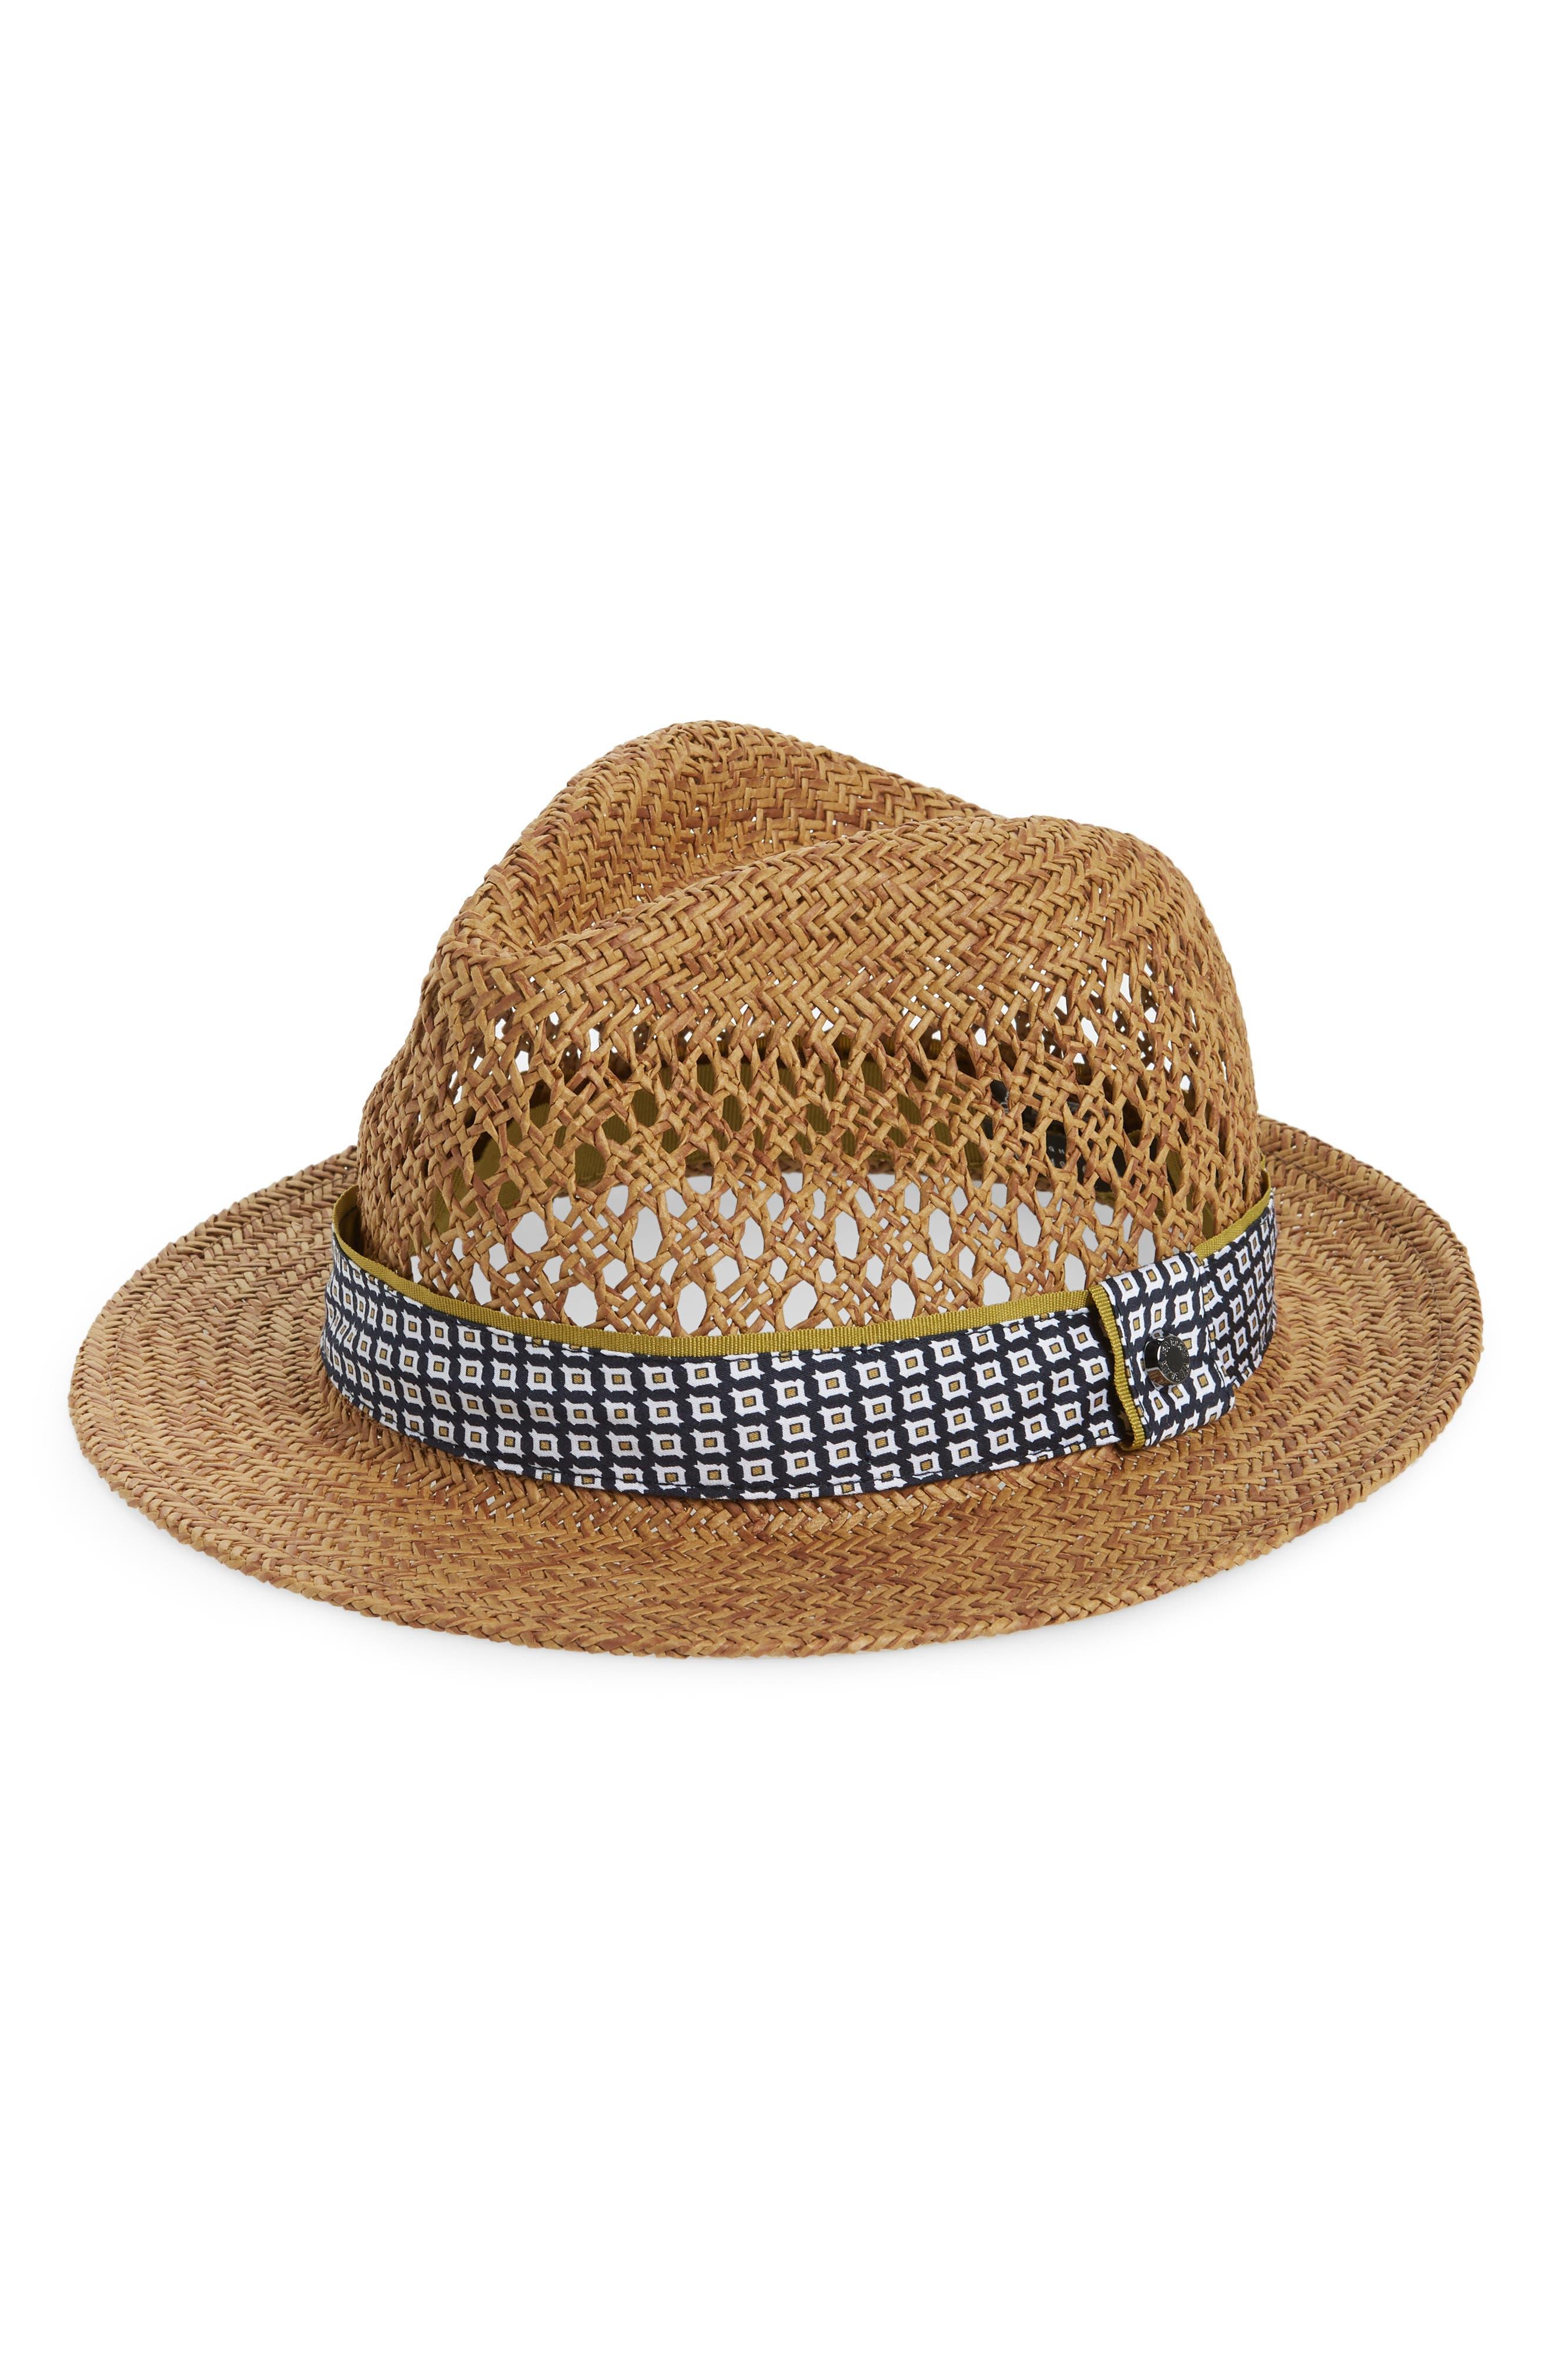 Harlow Straw Hat,                         Main,                         color, Natural